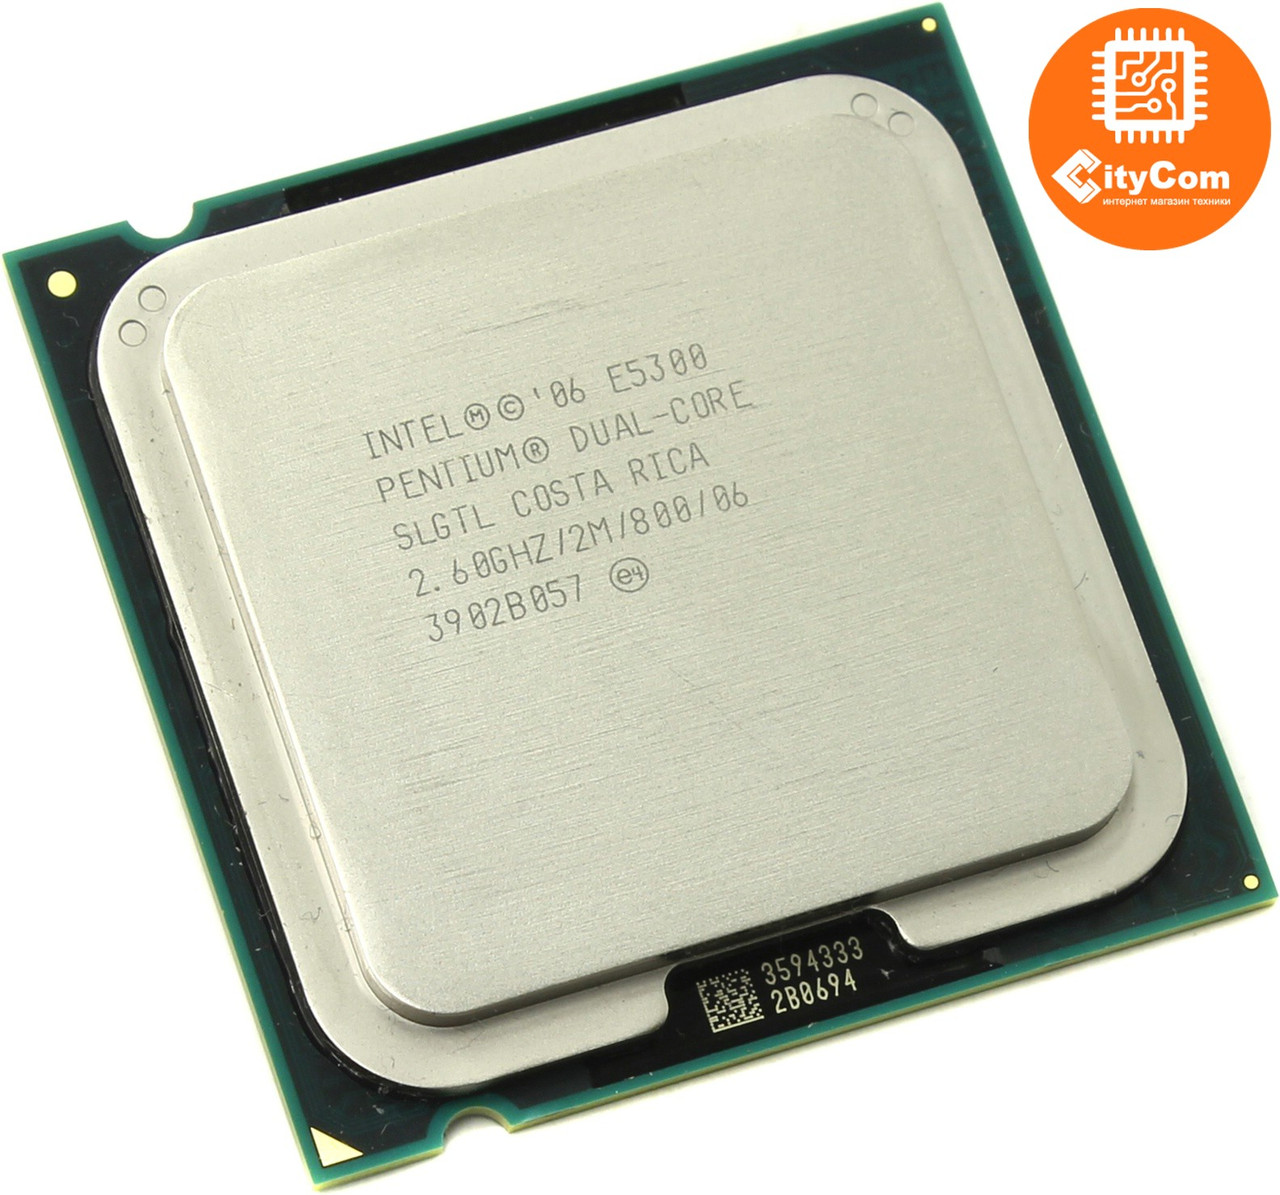 CPU S-775 Intel Pentium DualCore E5200 2.5GHz Арт.1377